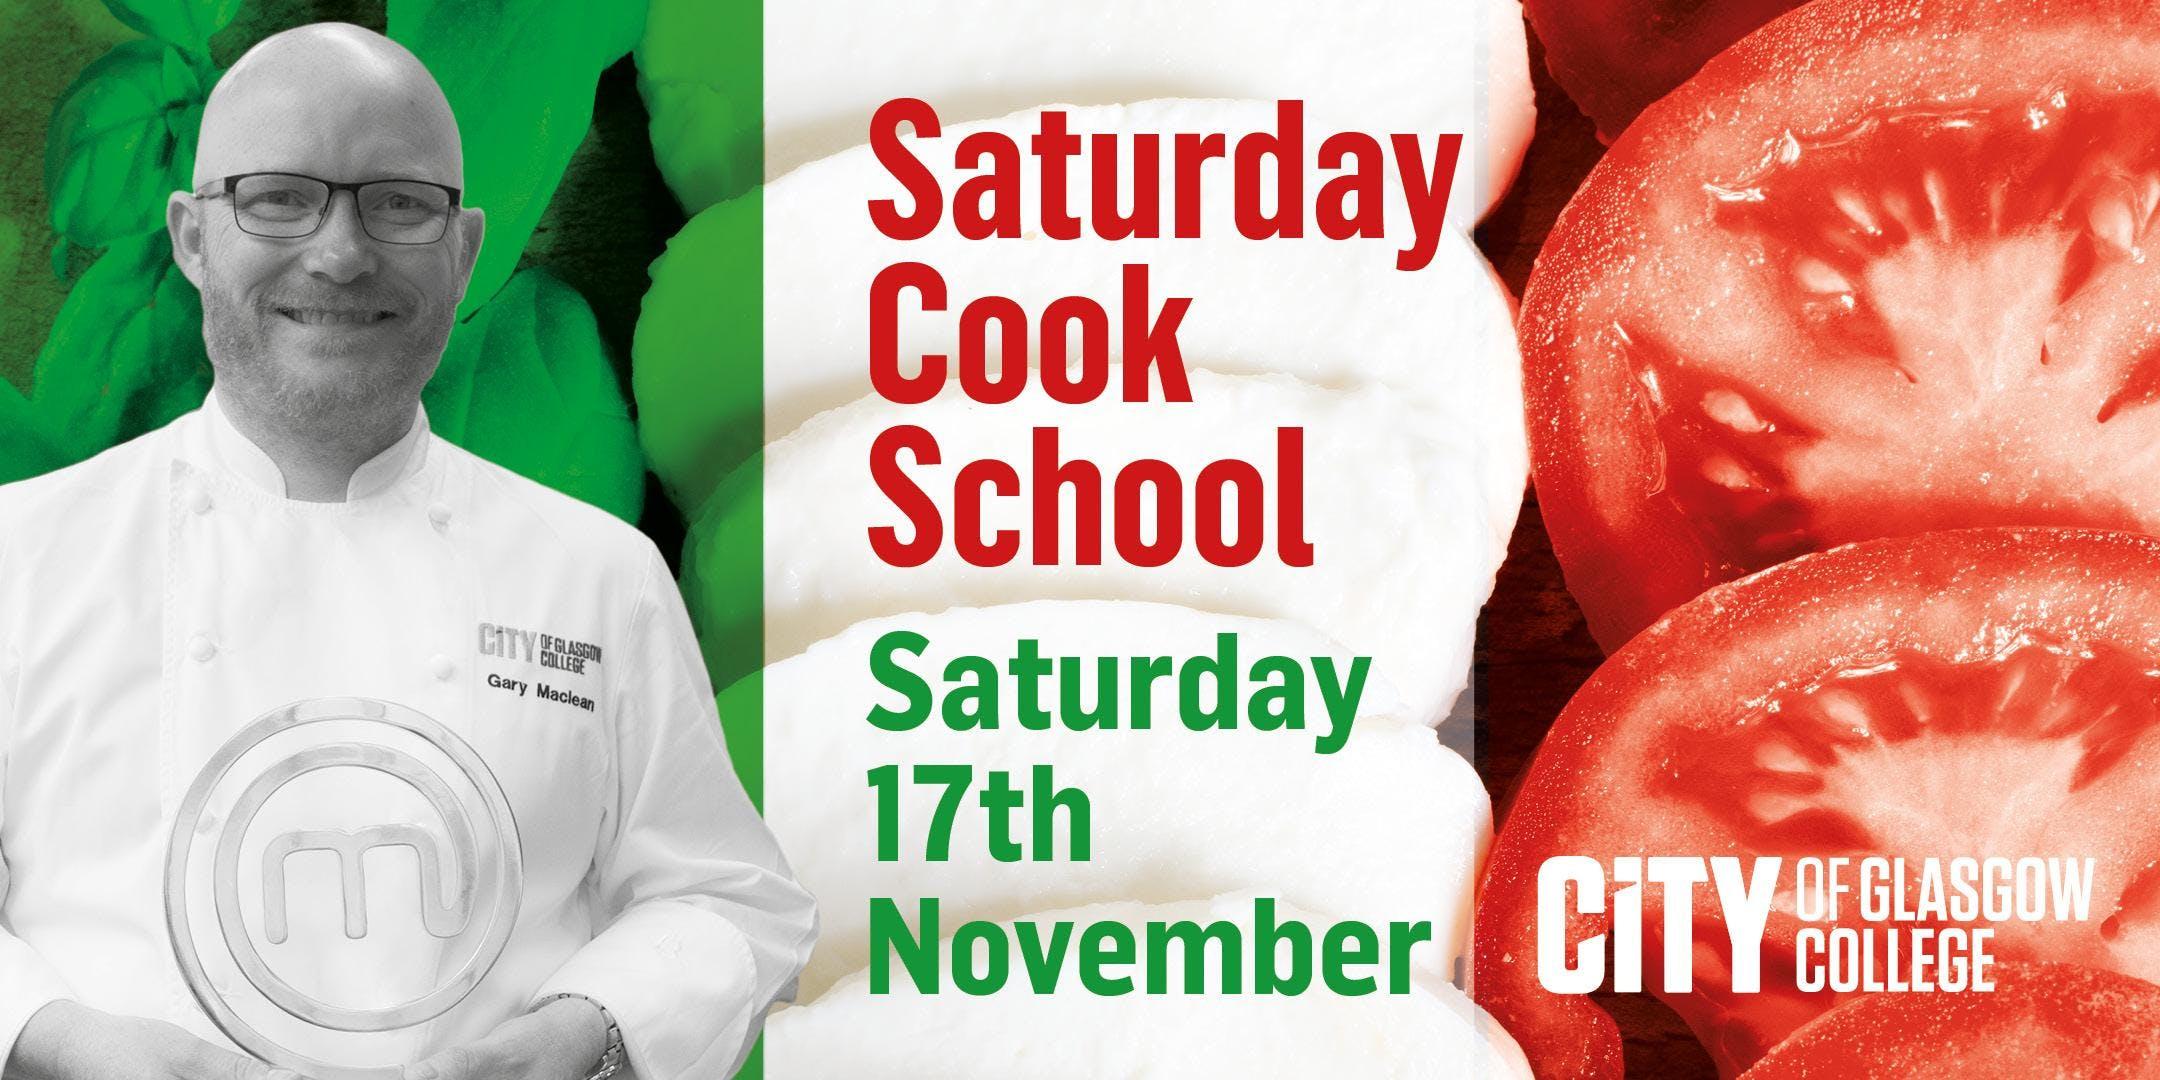 Saturday Cook School - Italian